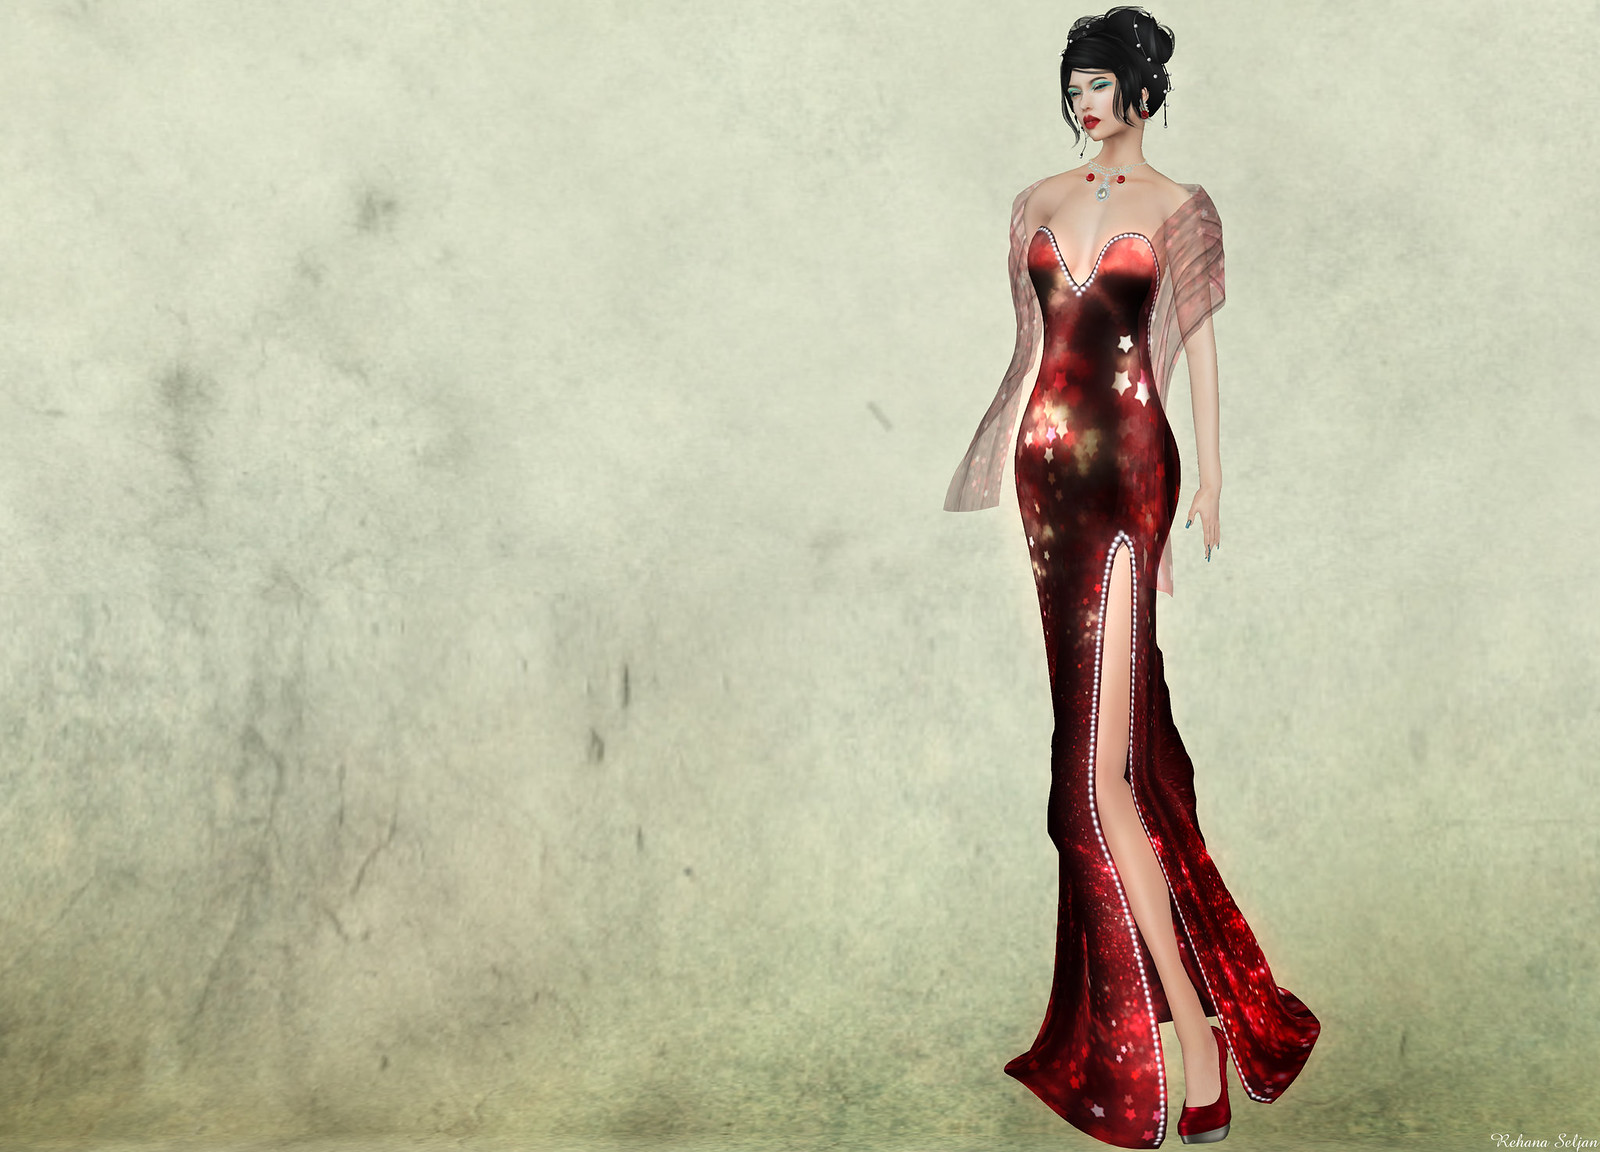 Styles by Danielle - Seren